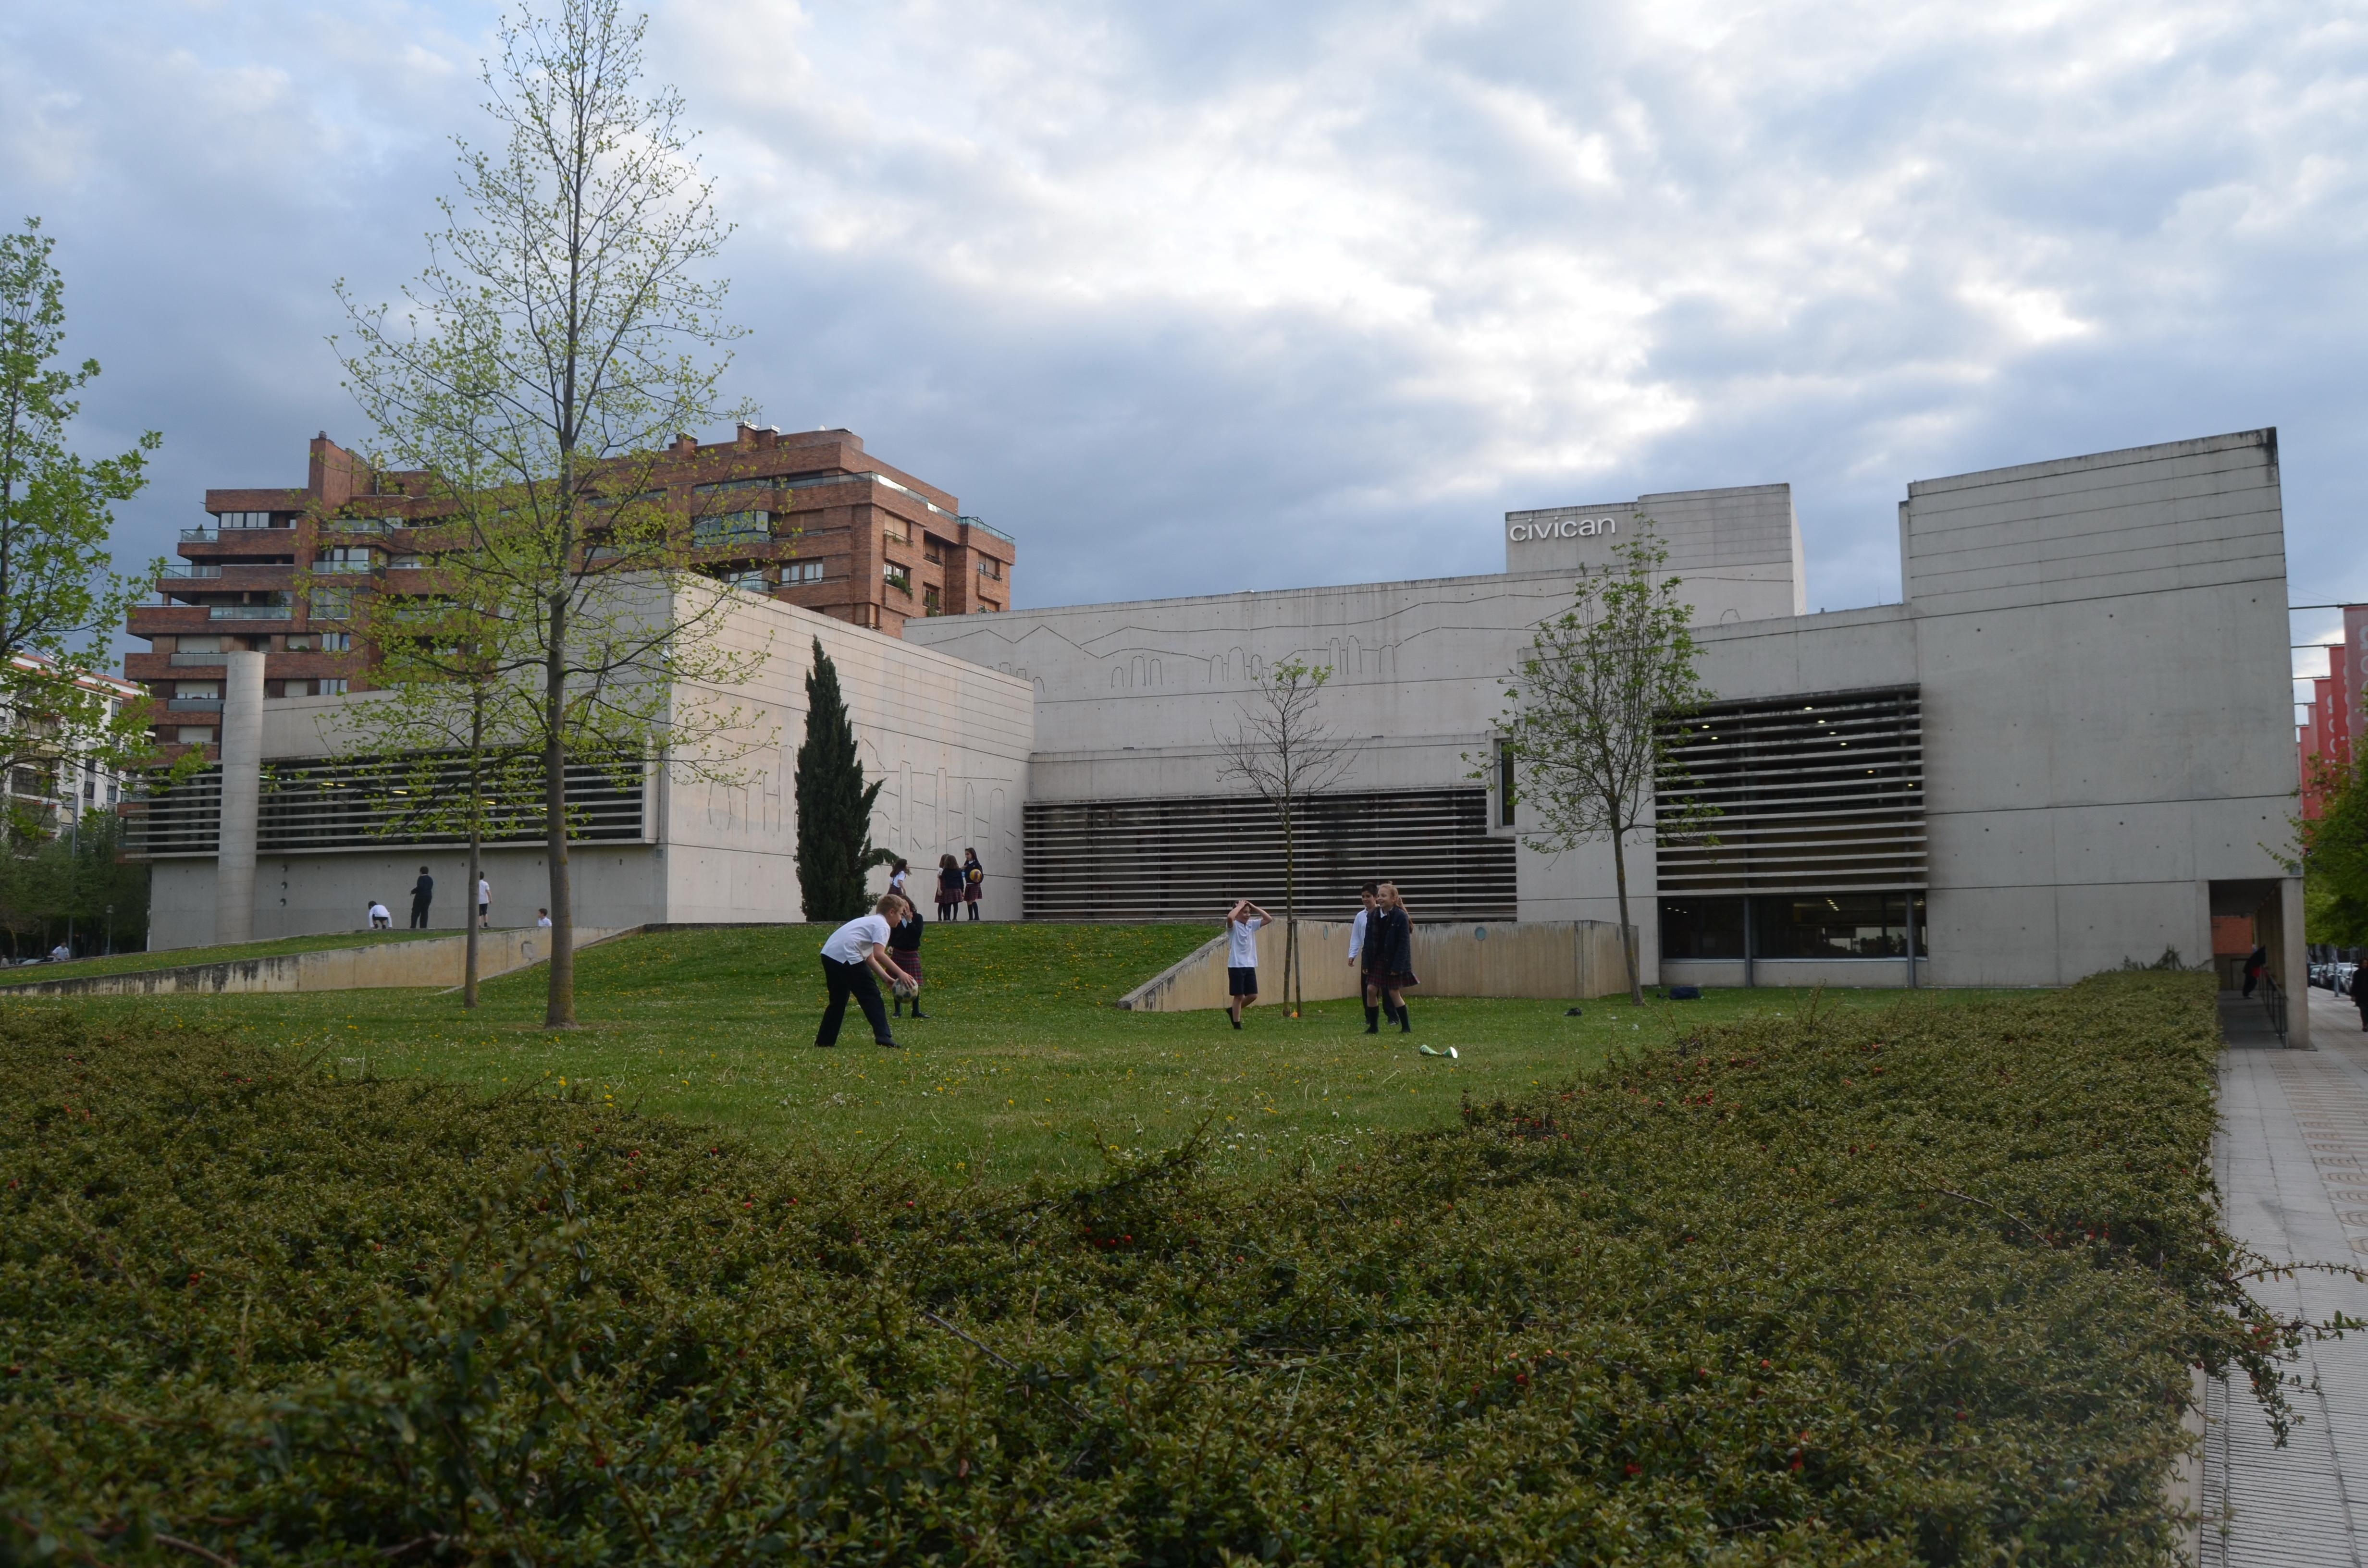 Pamplona/Iruña Civican